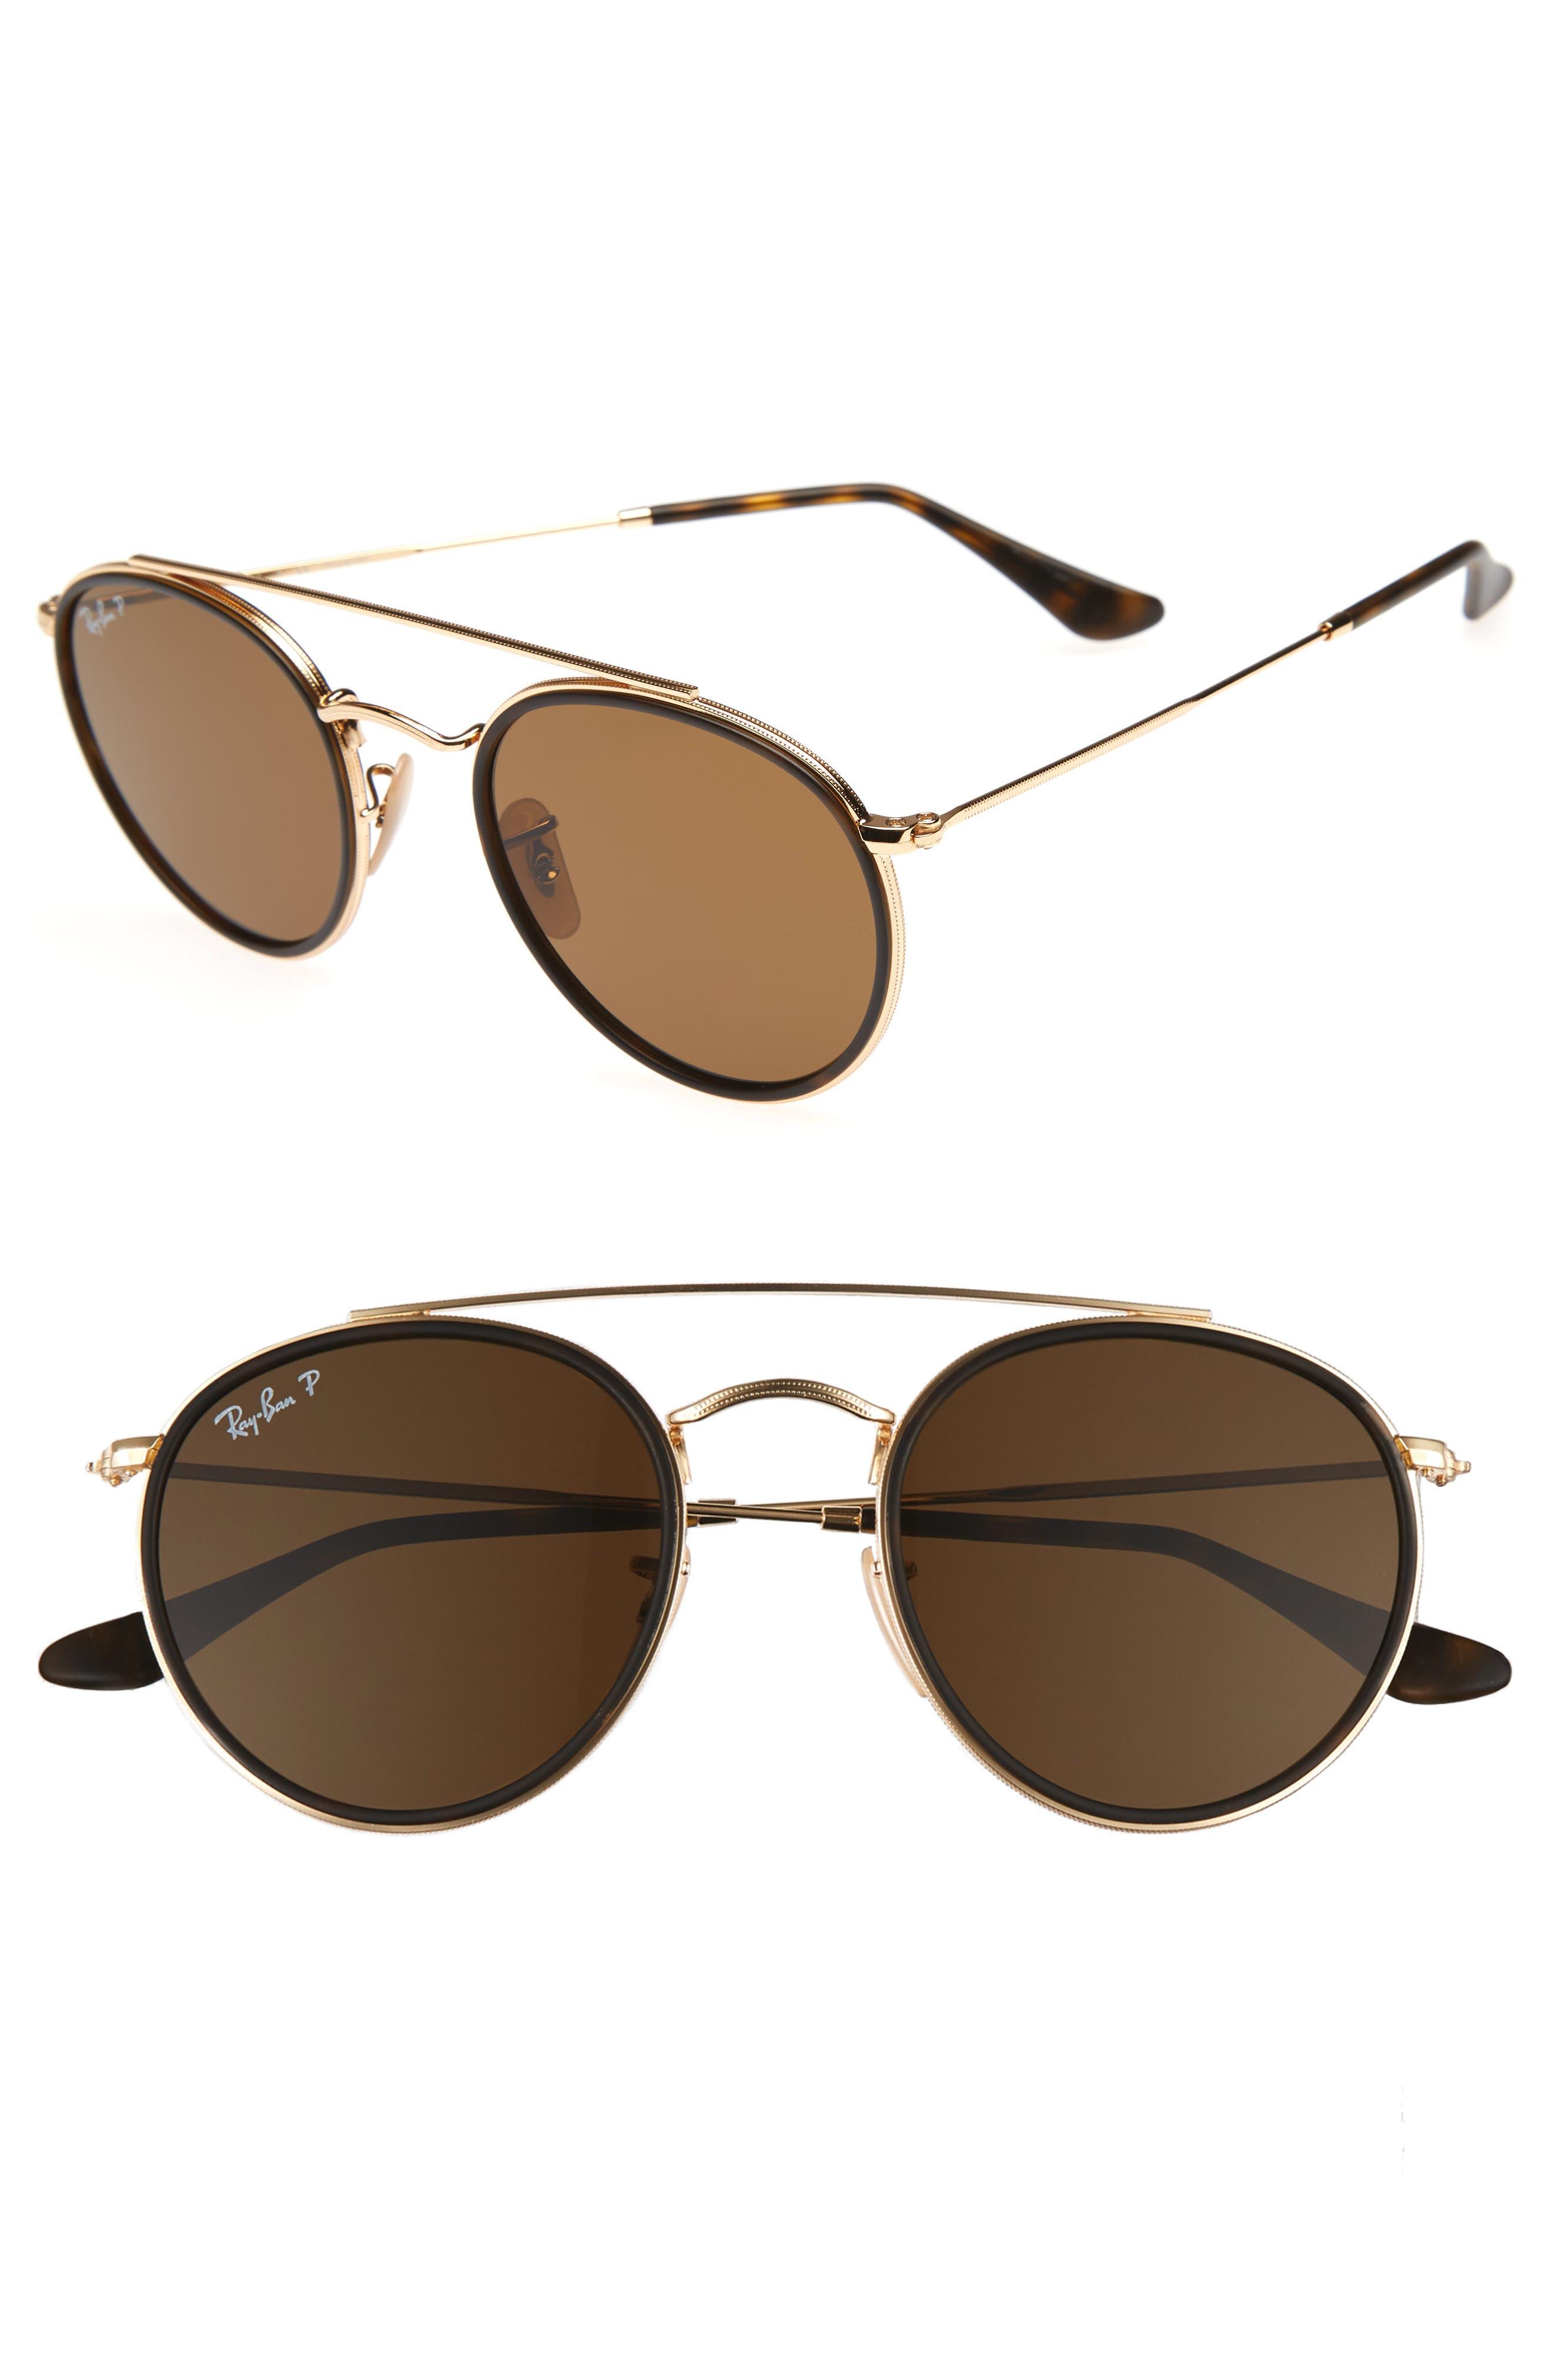 Main Image - Ray-Ban Icons 51mm Round Sunglasses